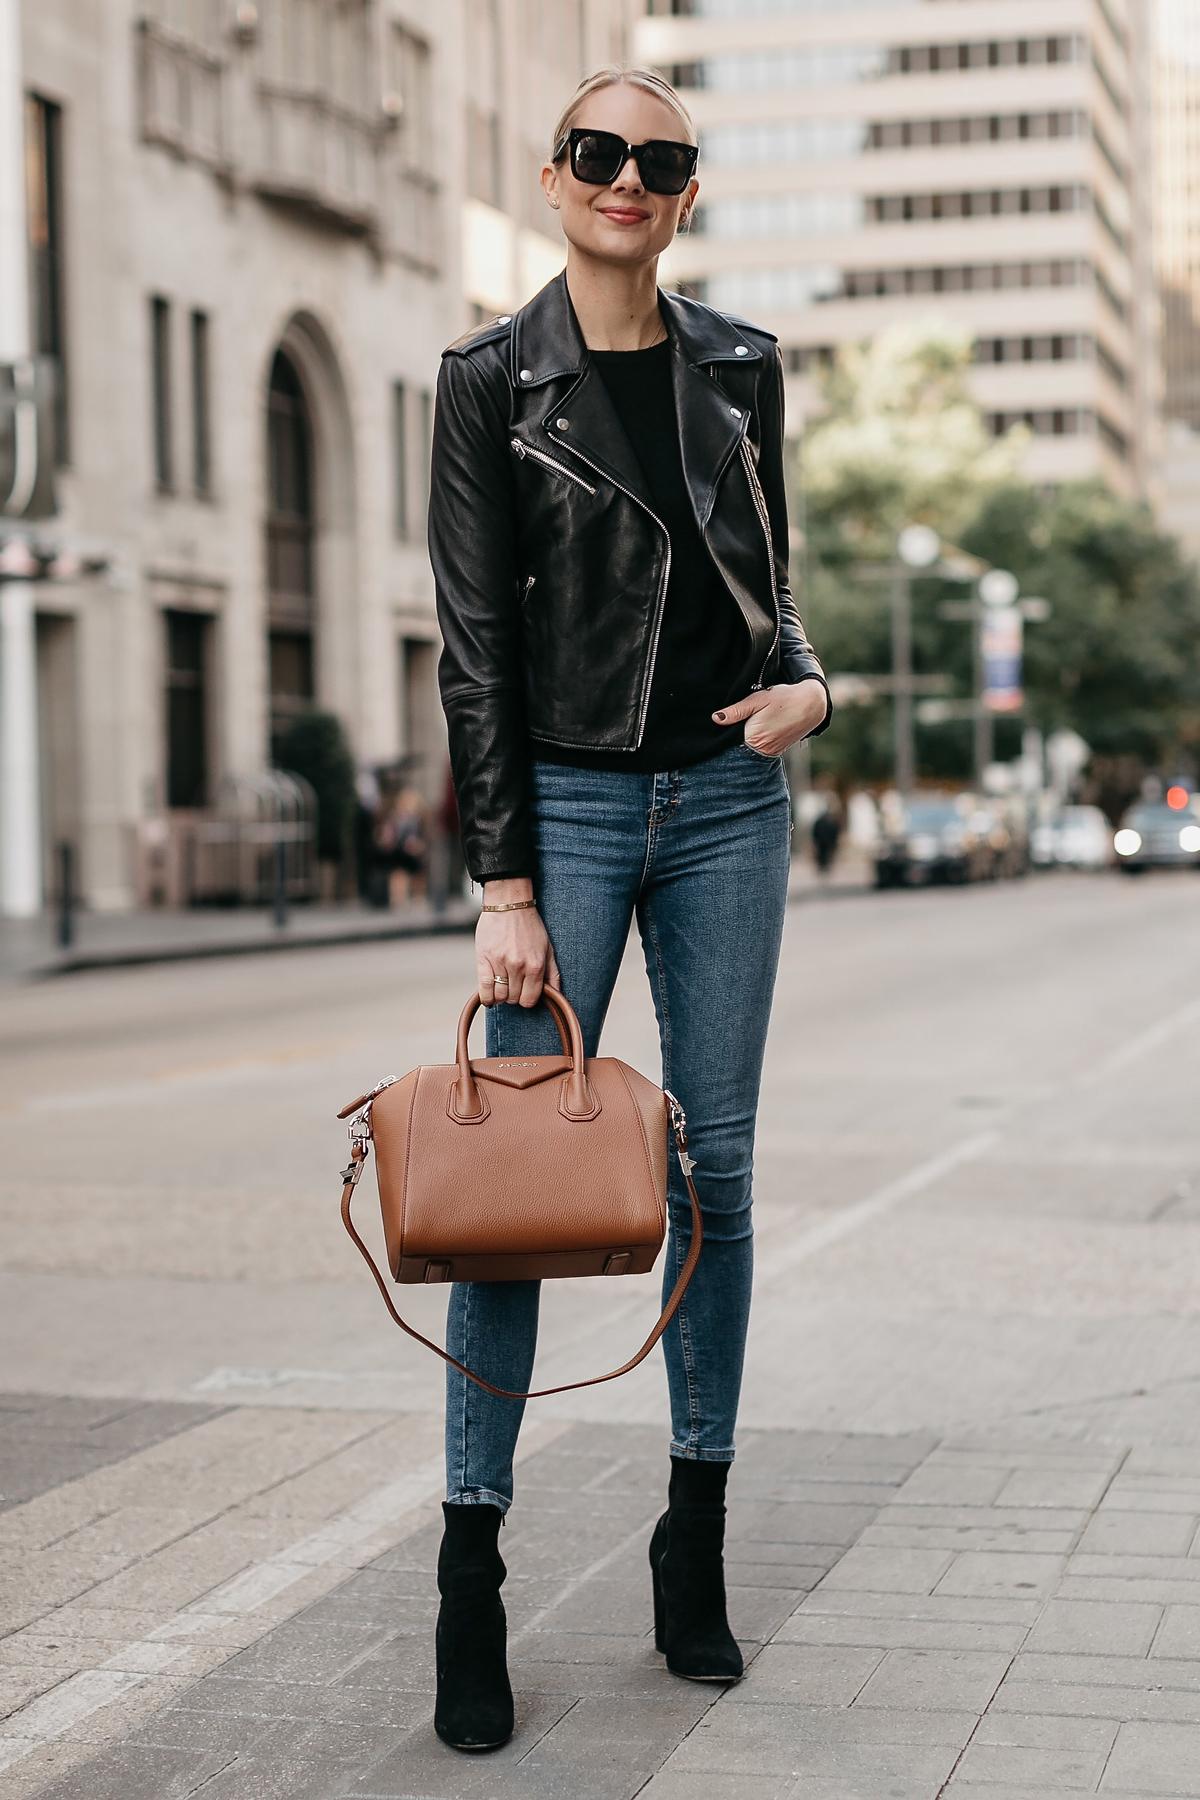 Blonde Woman Wearing Black Leather Jacket Denim Skinny Jeans Black Booties Givenchy Antigona Cognac Satchel Fashion Jackson Dallas Blogger Fashion Blogger Street Style